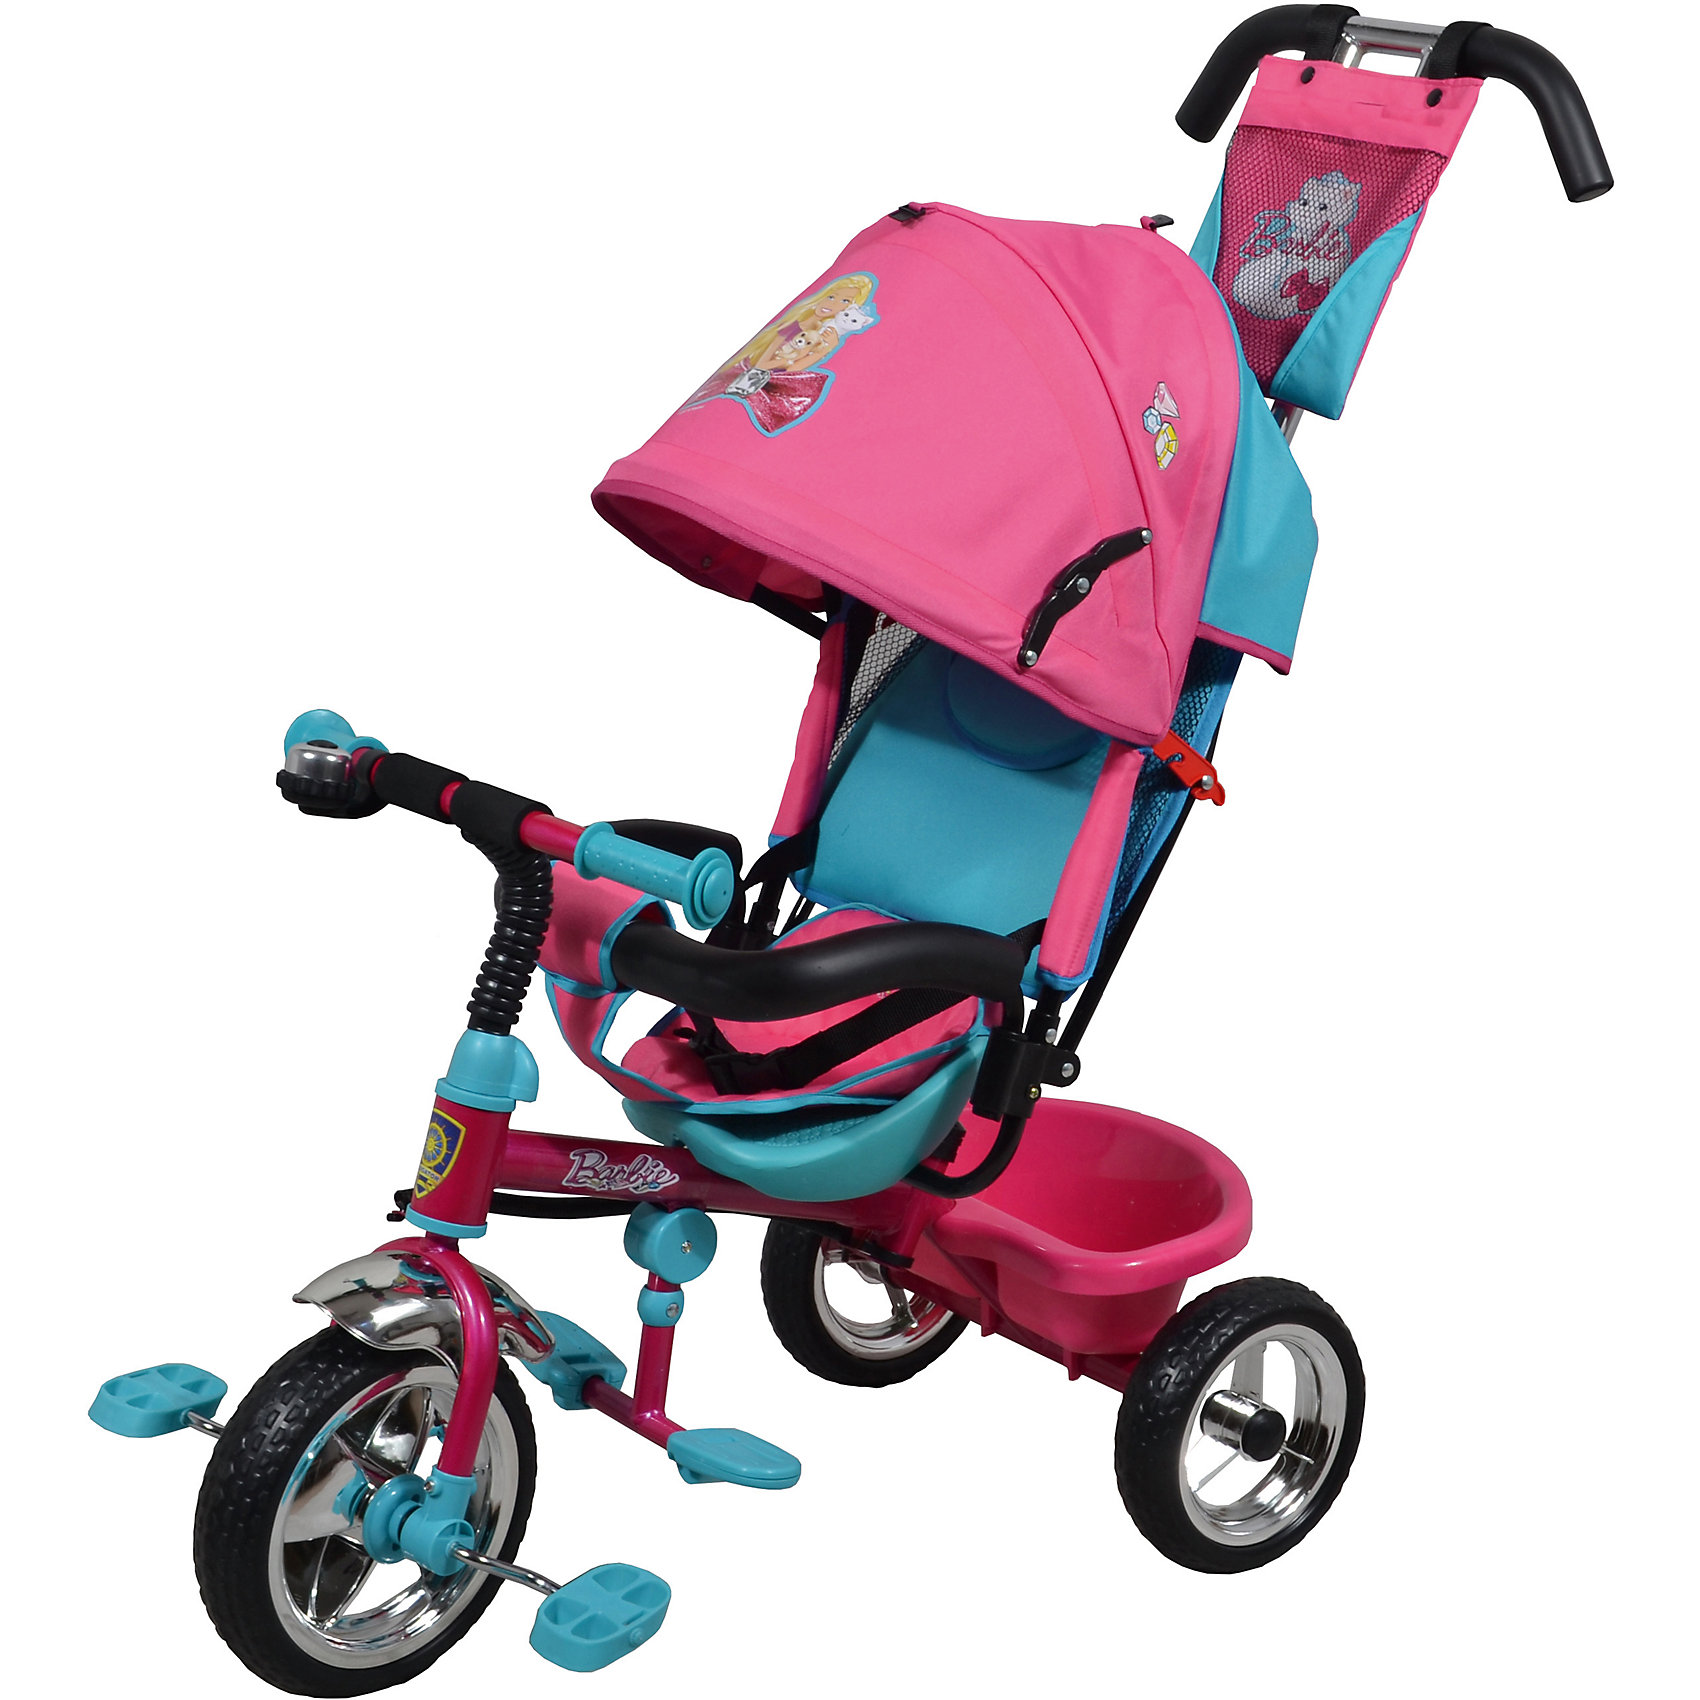 Lexus Trike Трехколесный велосипед Navigator, Barbie, Lexus велосипед для малыша navigator lexus safari trike т56790